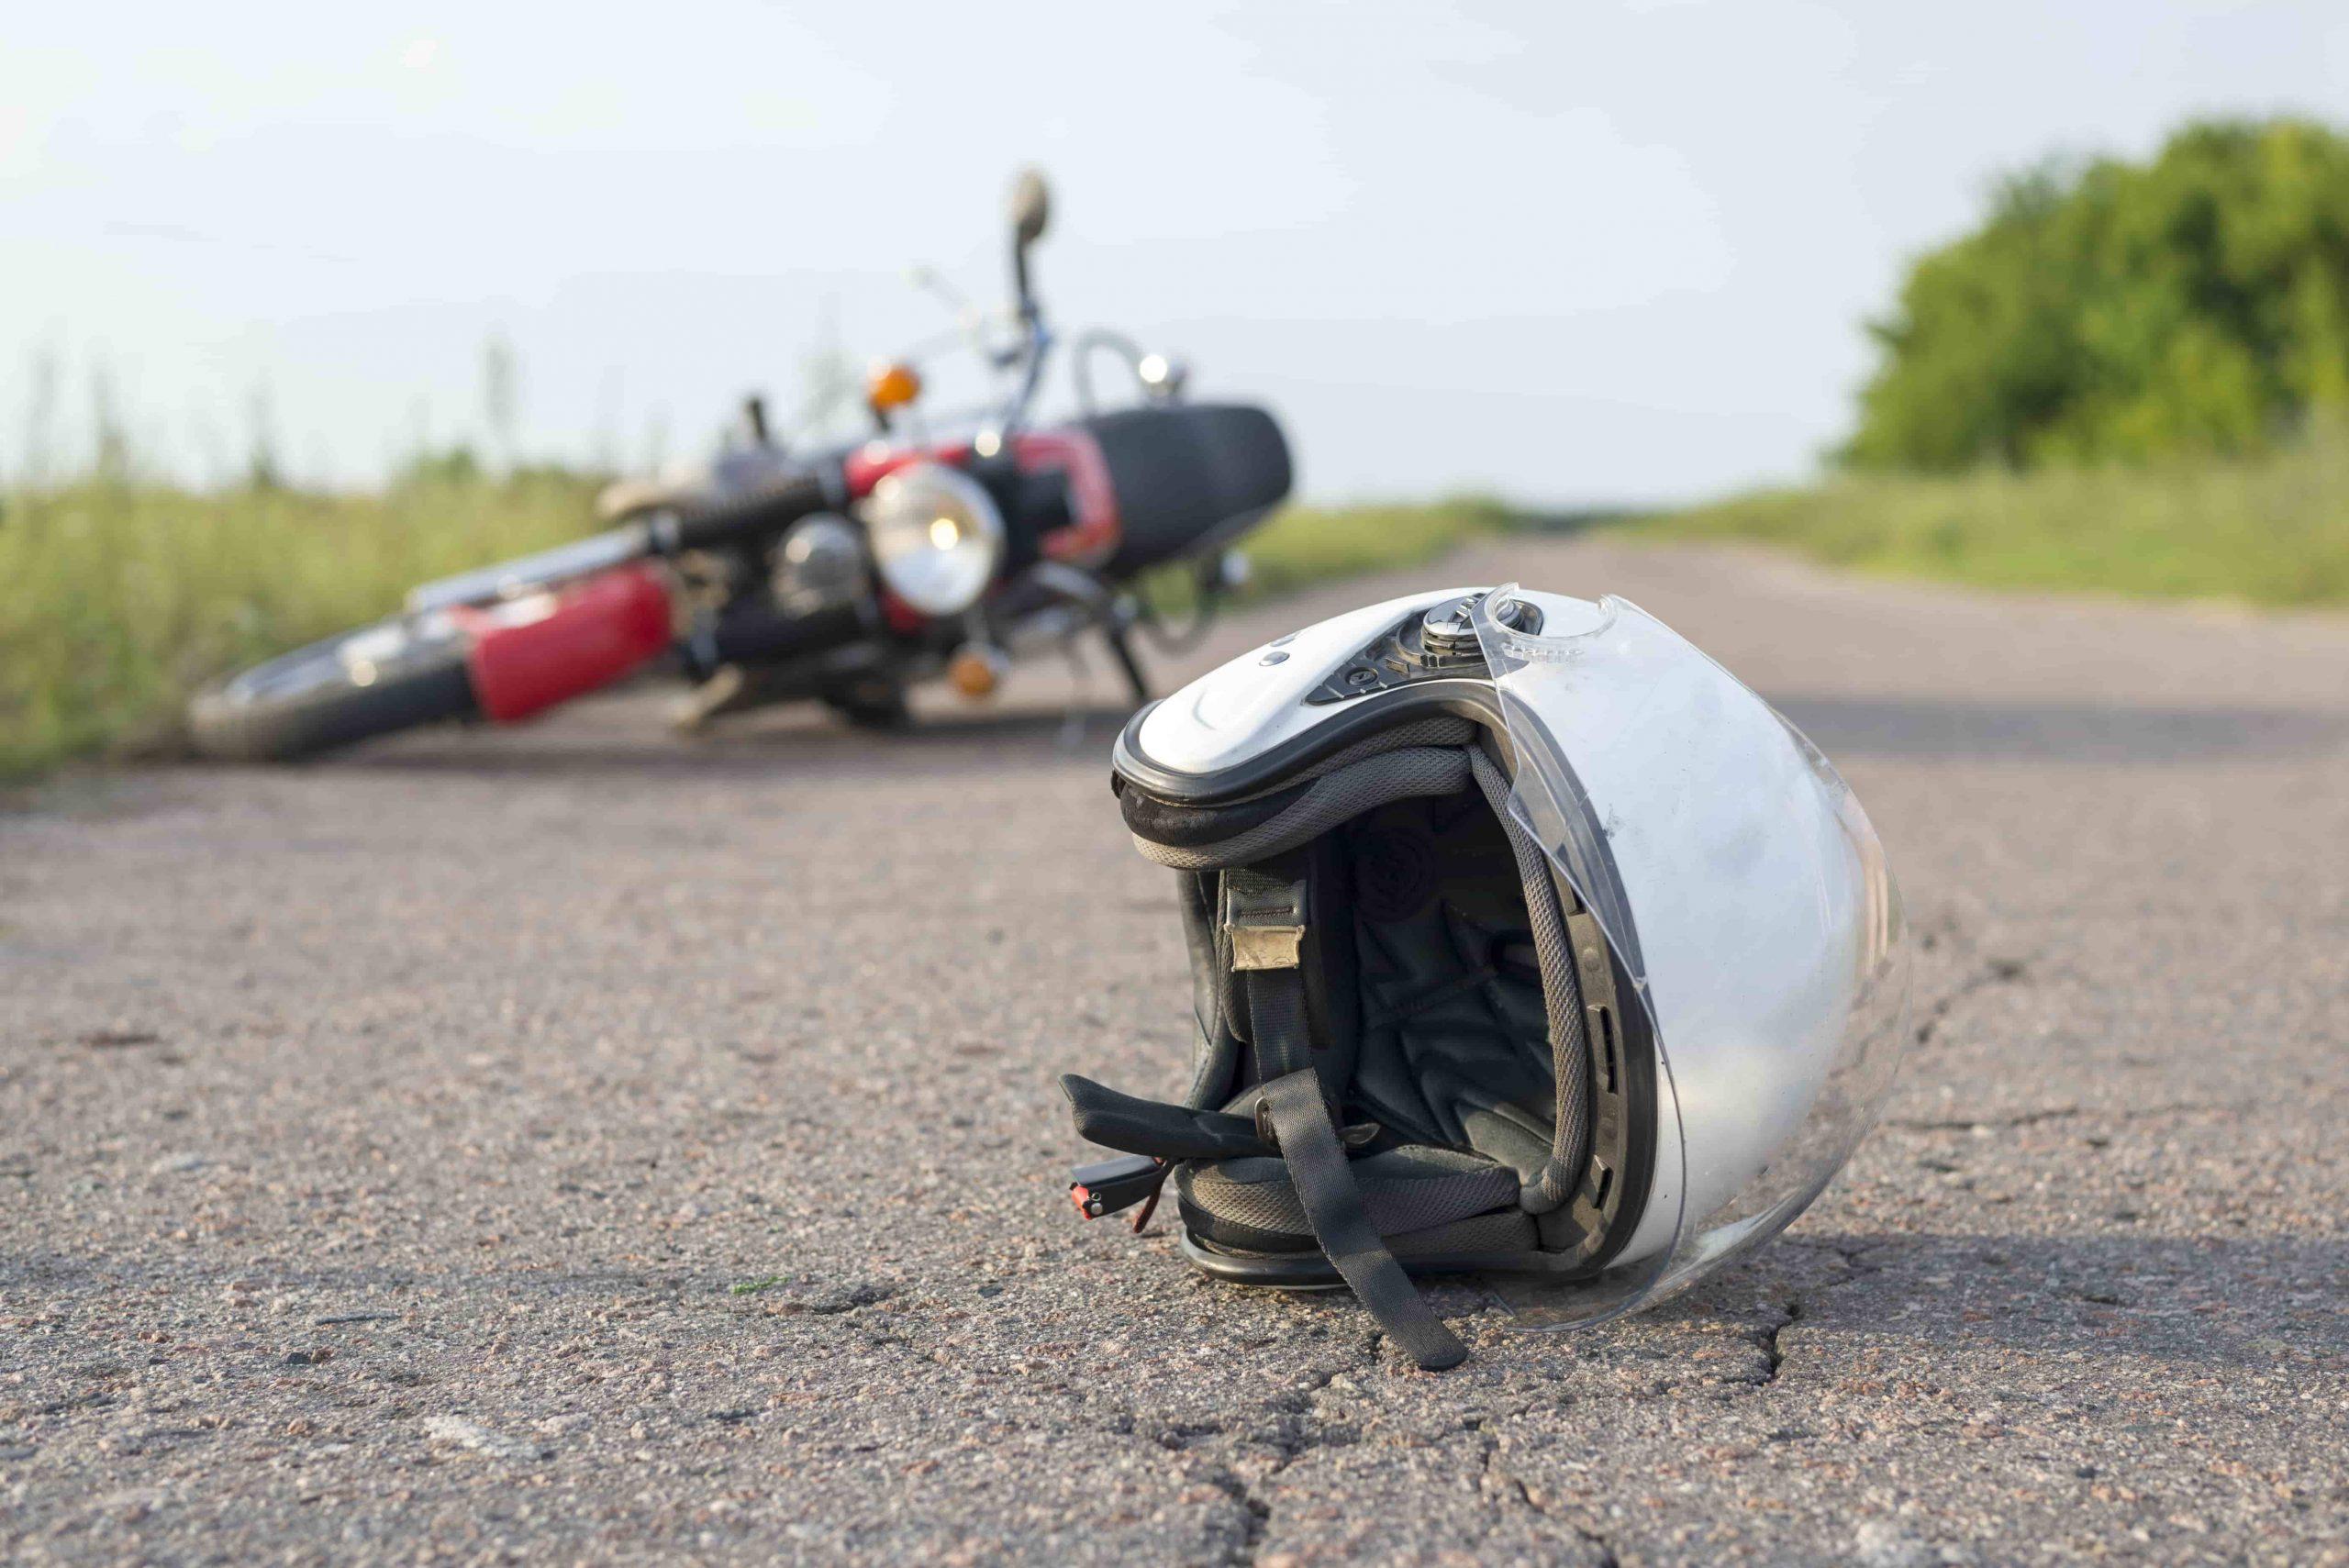 Accidente de moto. @Istock